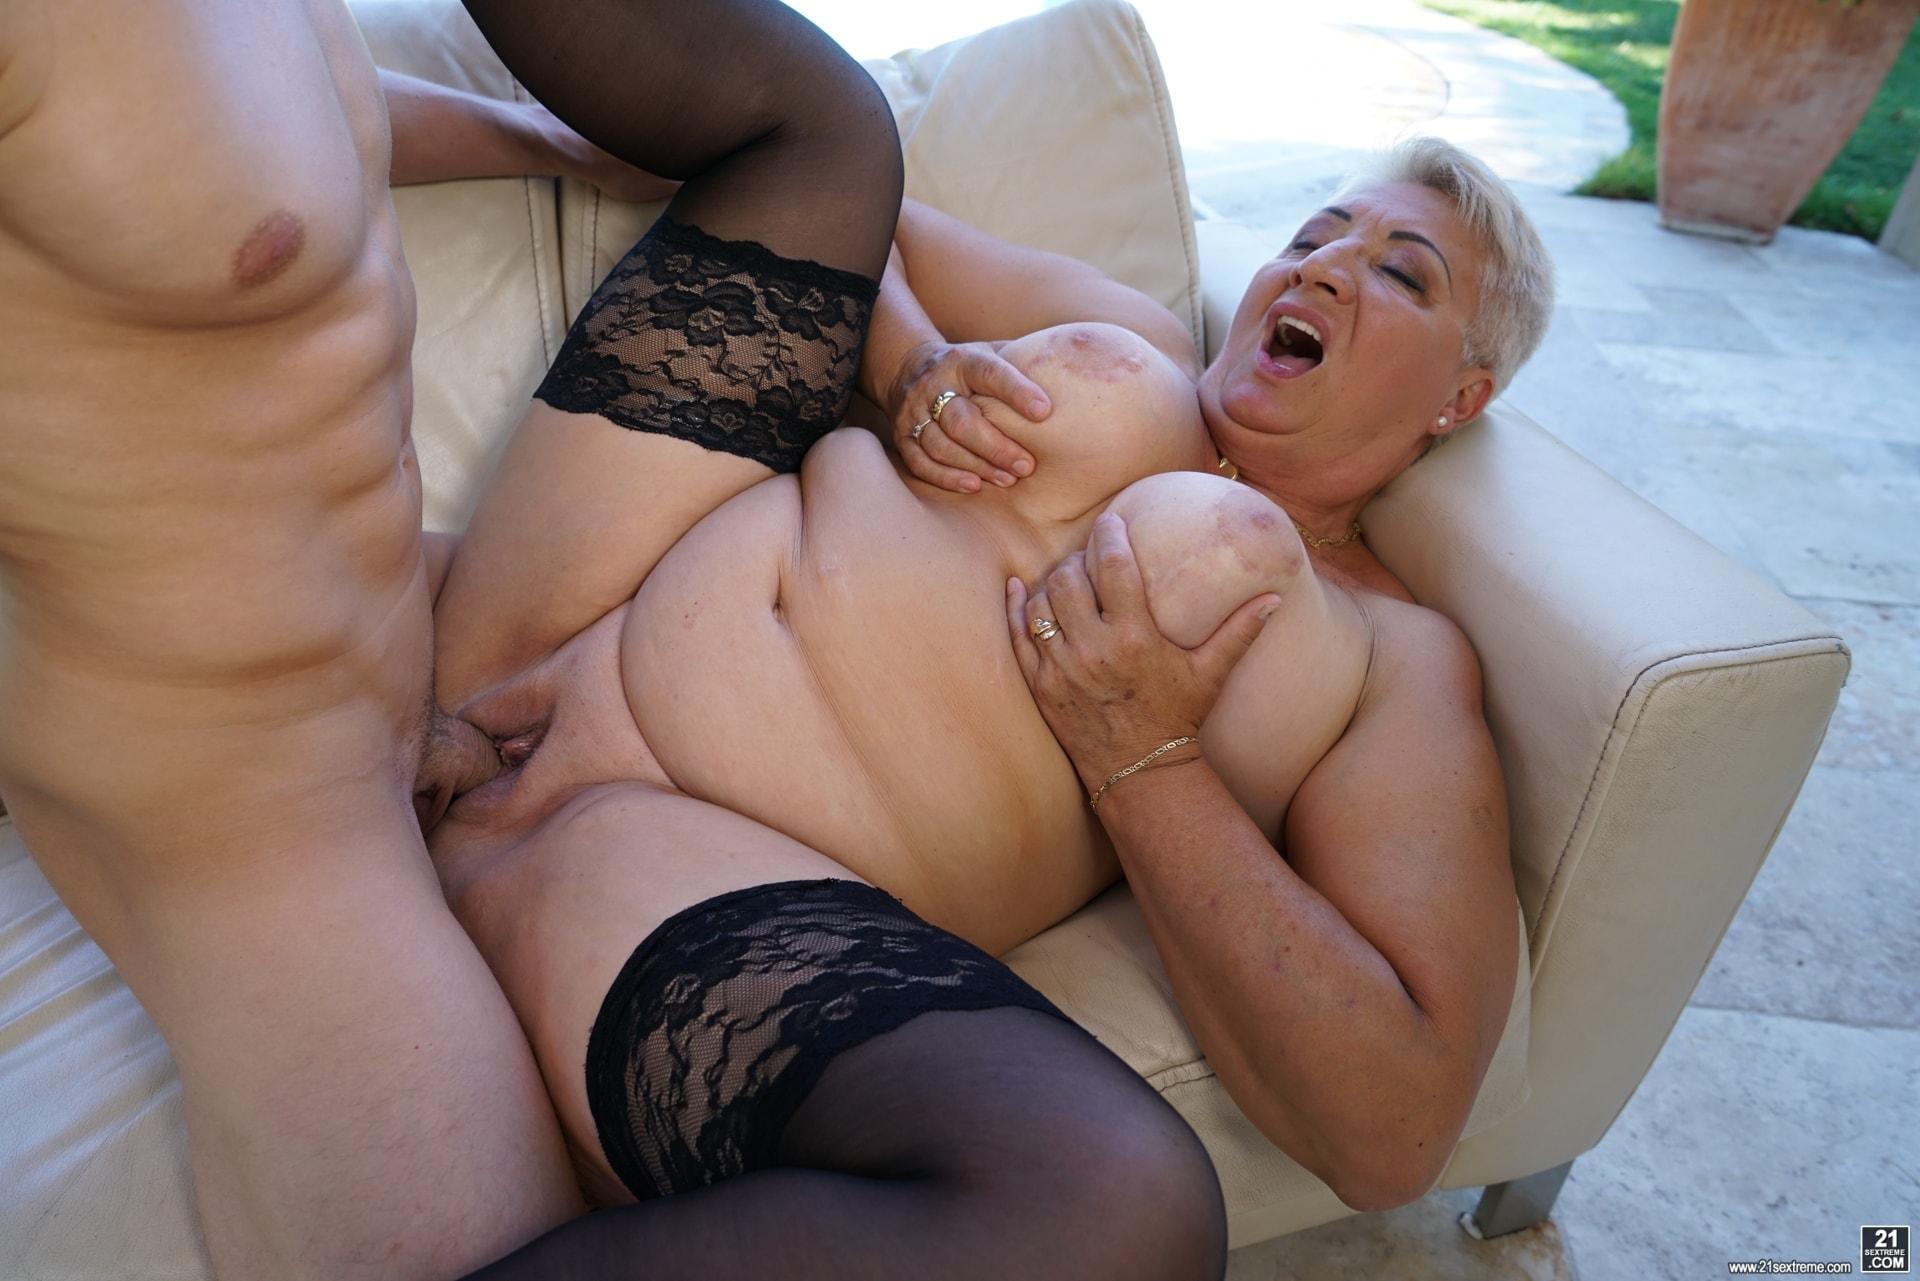 21Sextury 'Lusty Granny's Poolside Fuck' starring Astrid (Photo 216)